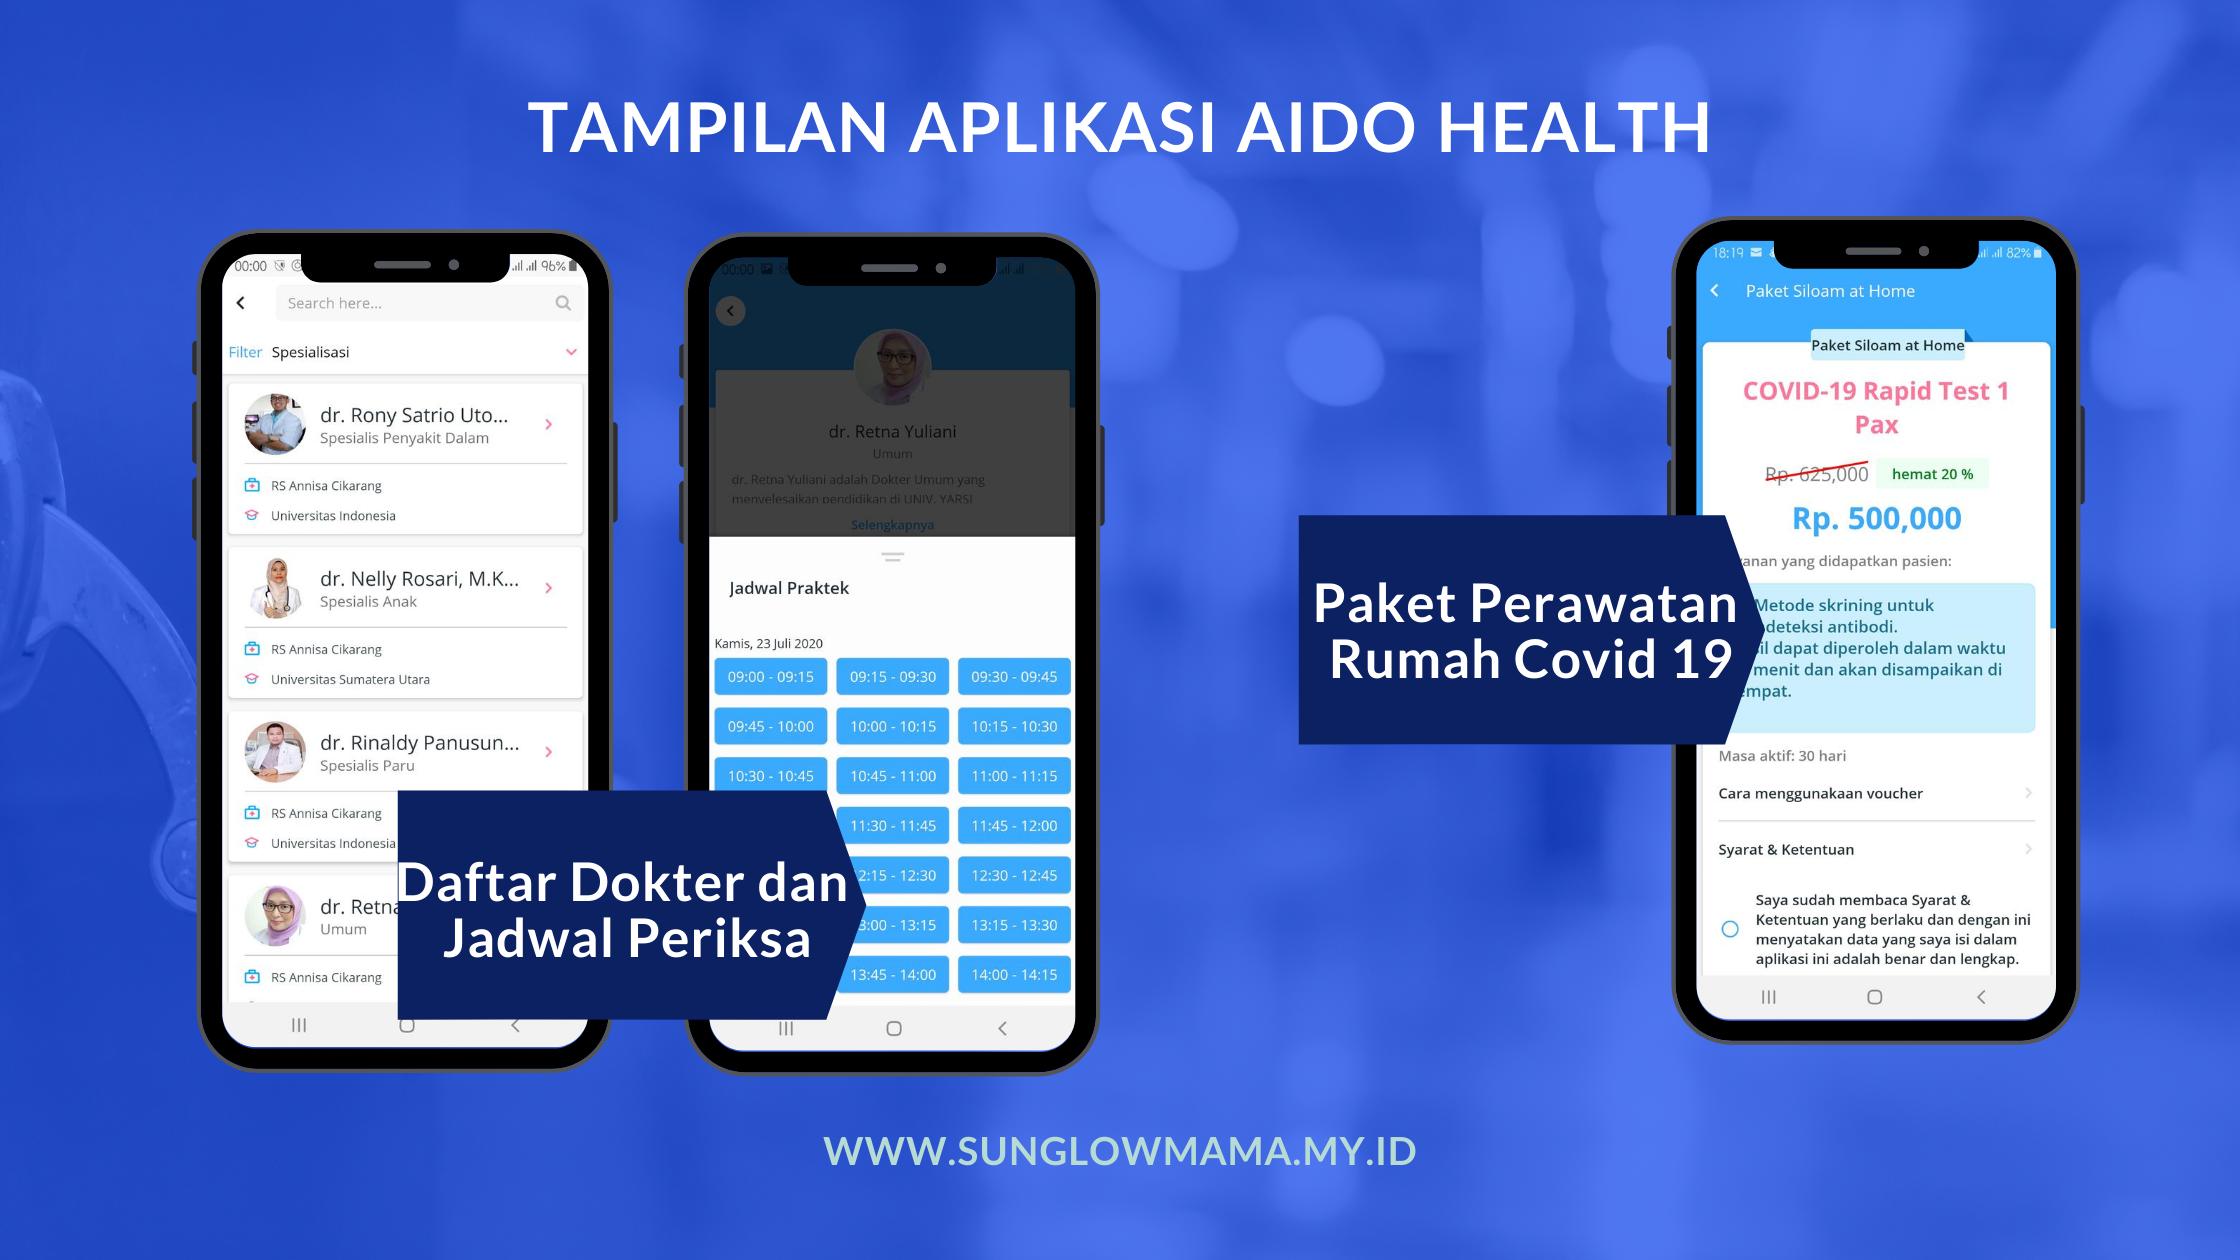 Tampilan aplikasi aido health